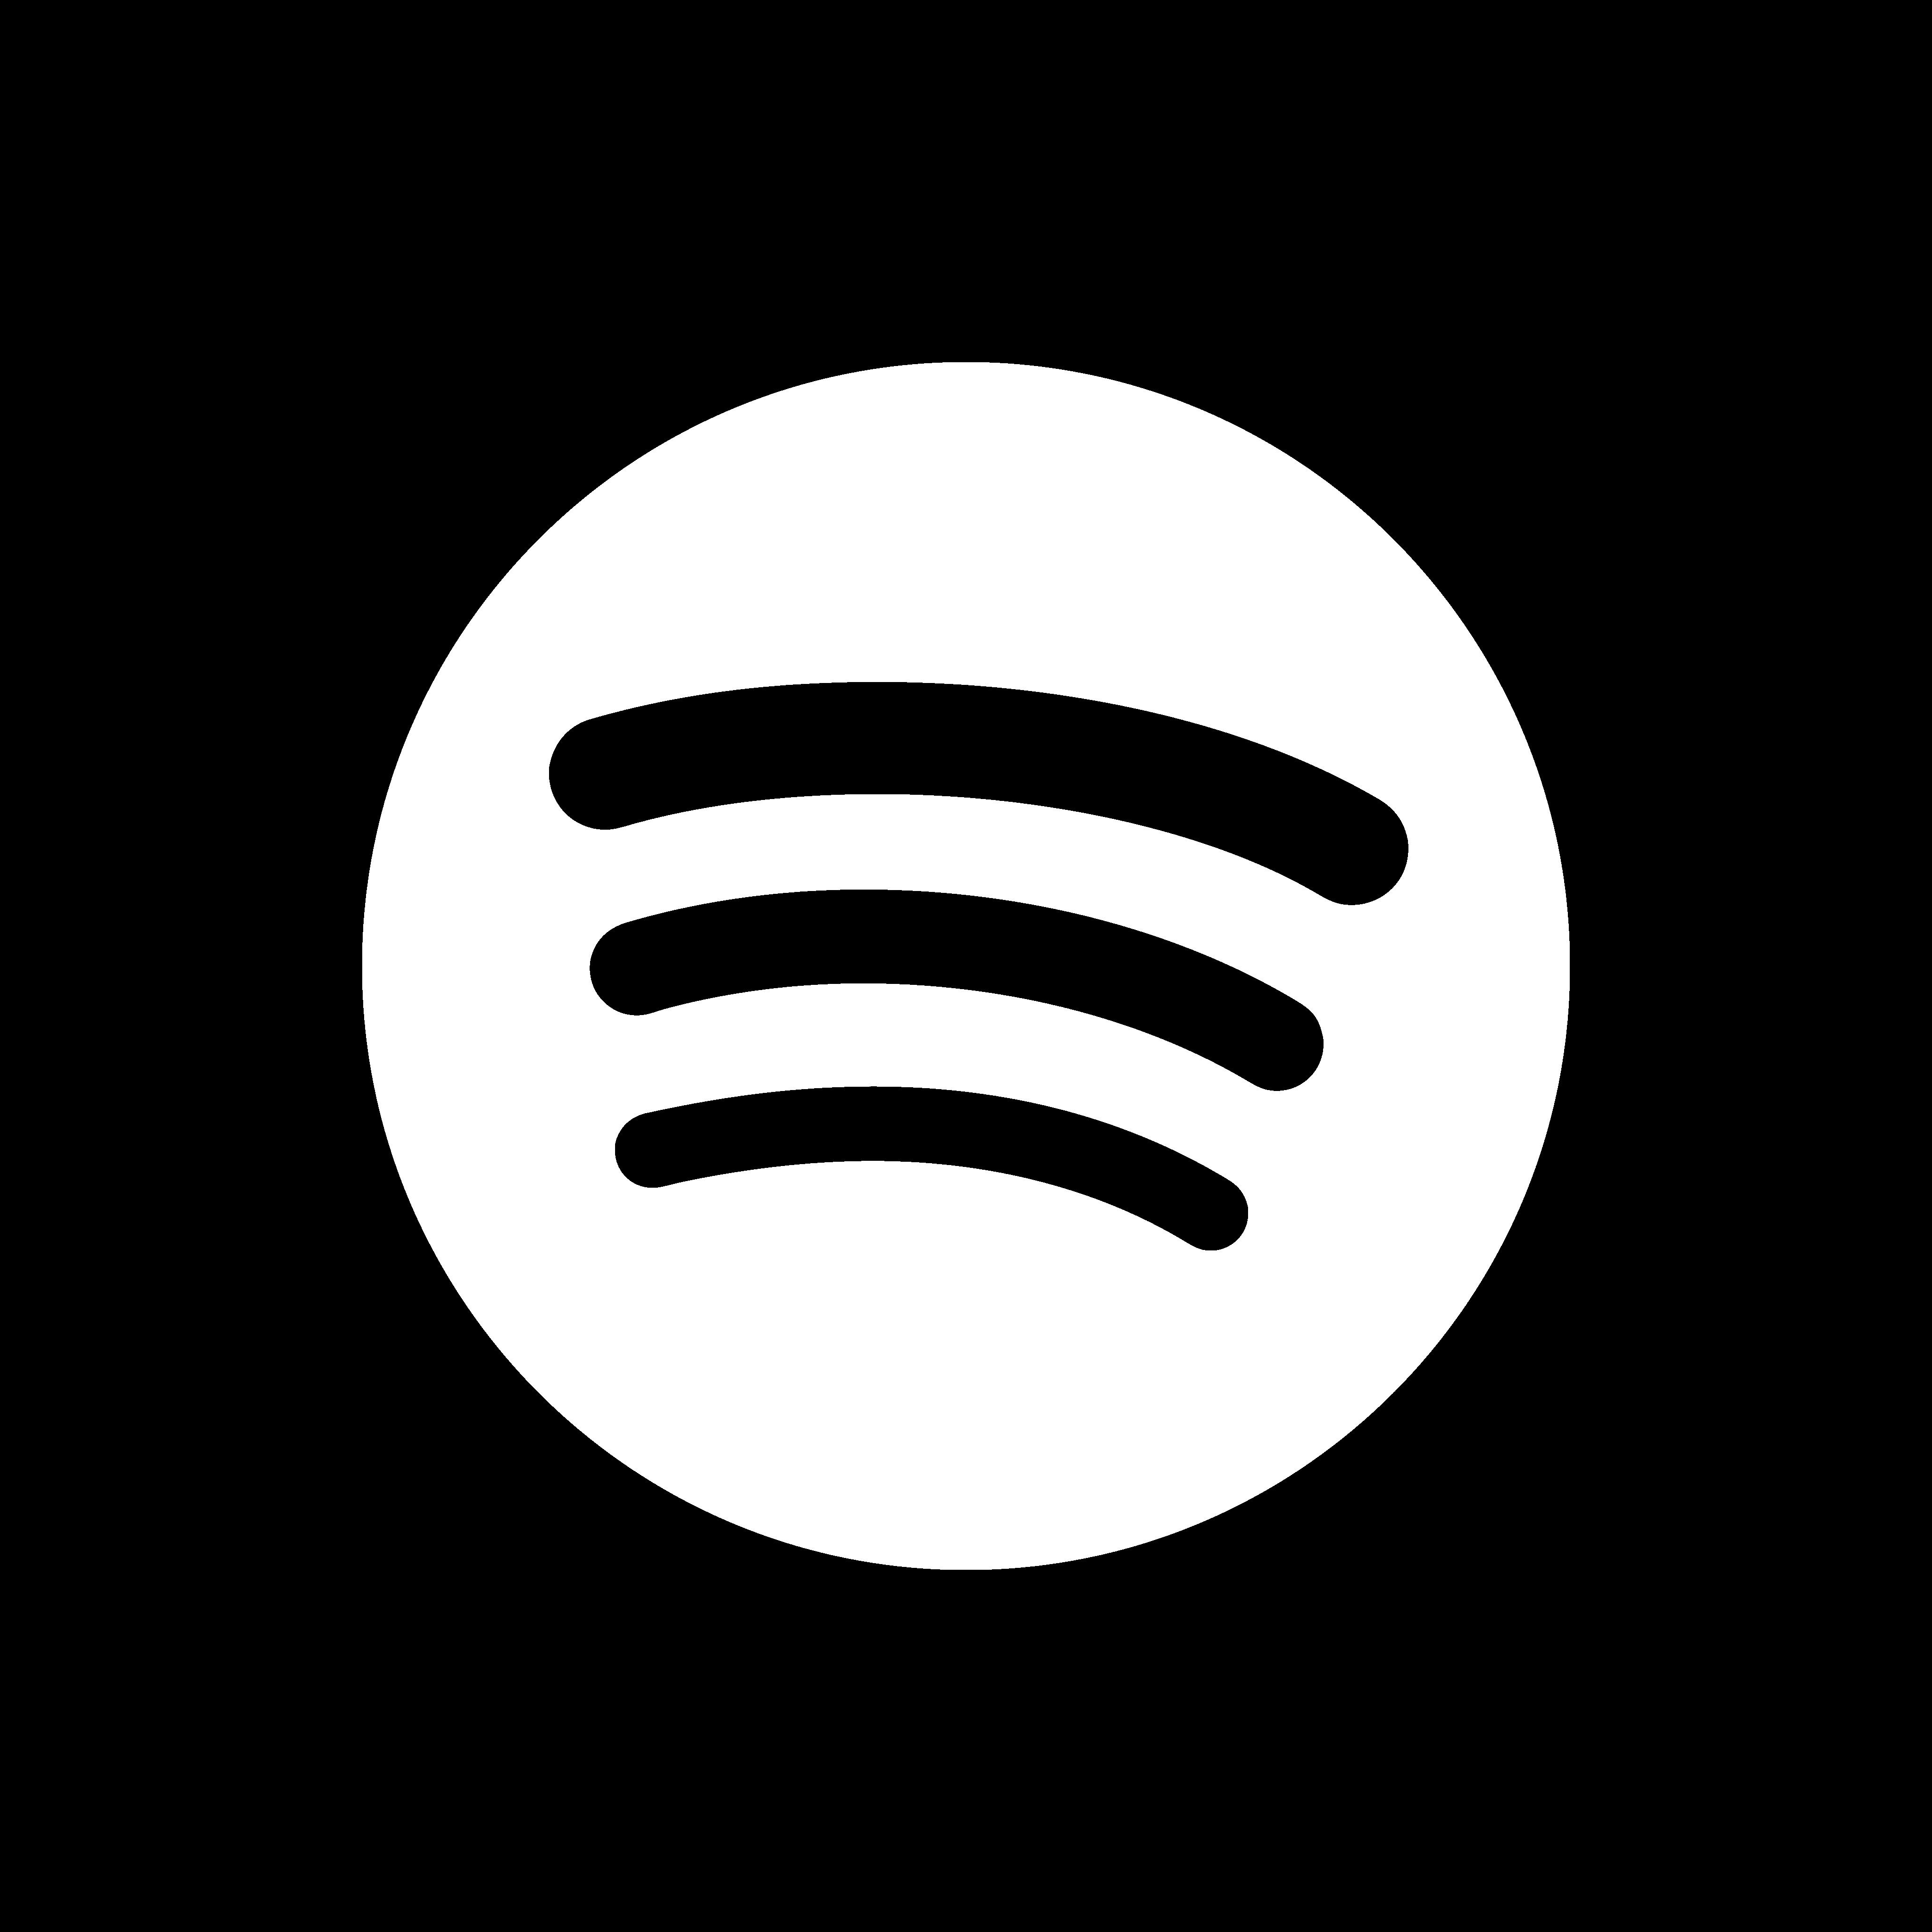 http://open.spotify.com/album/2AE6n7c0sYbIrP0hYQ0tgi